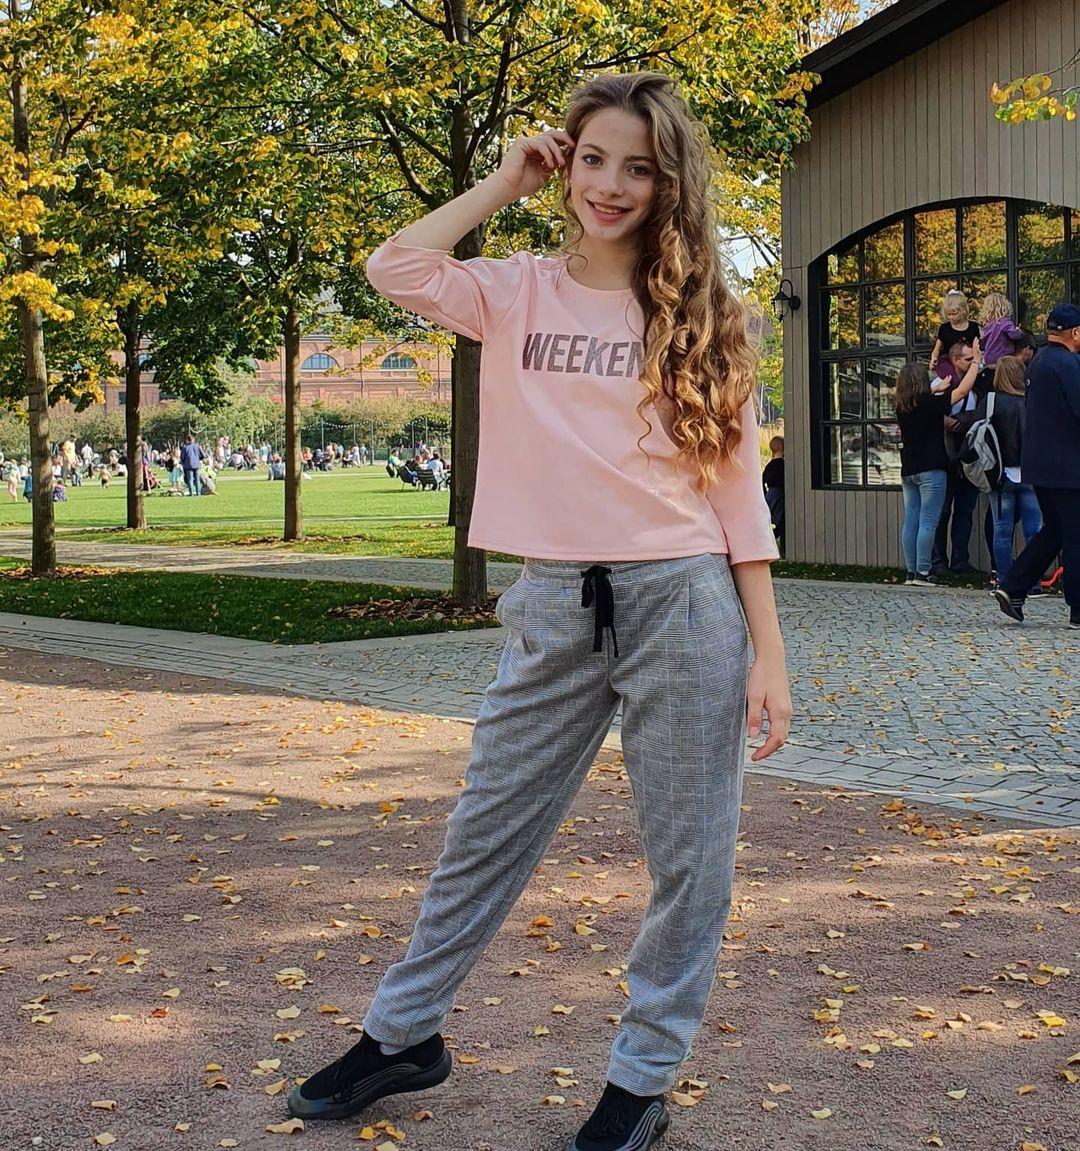 Anna-Gloss-Wallpapers-Insta-Fit-Bio-6